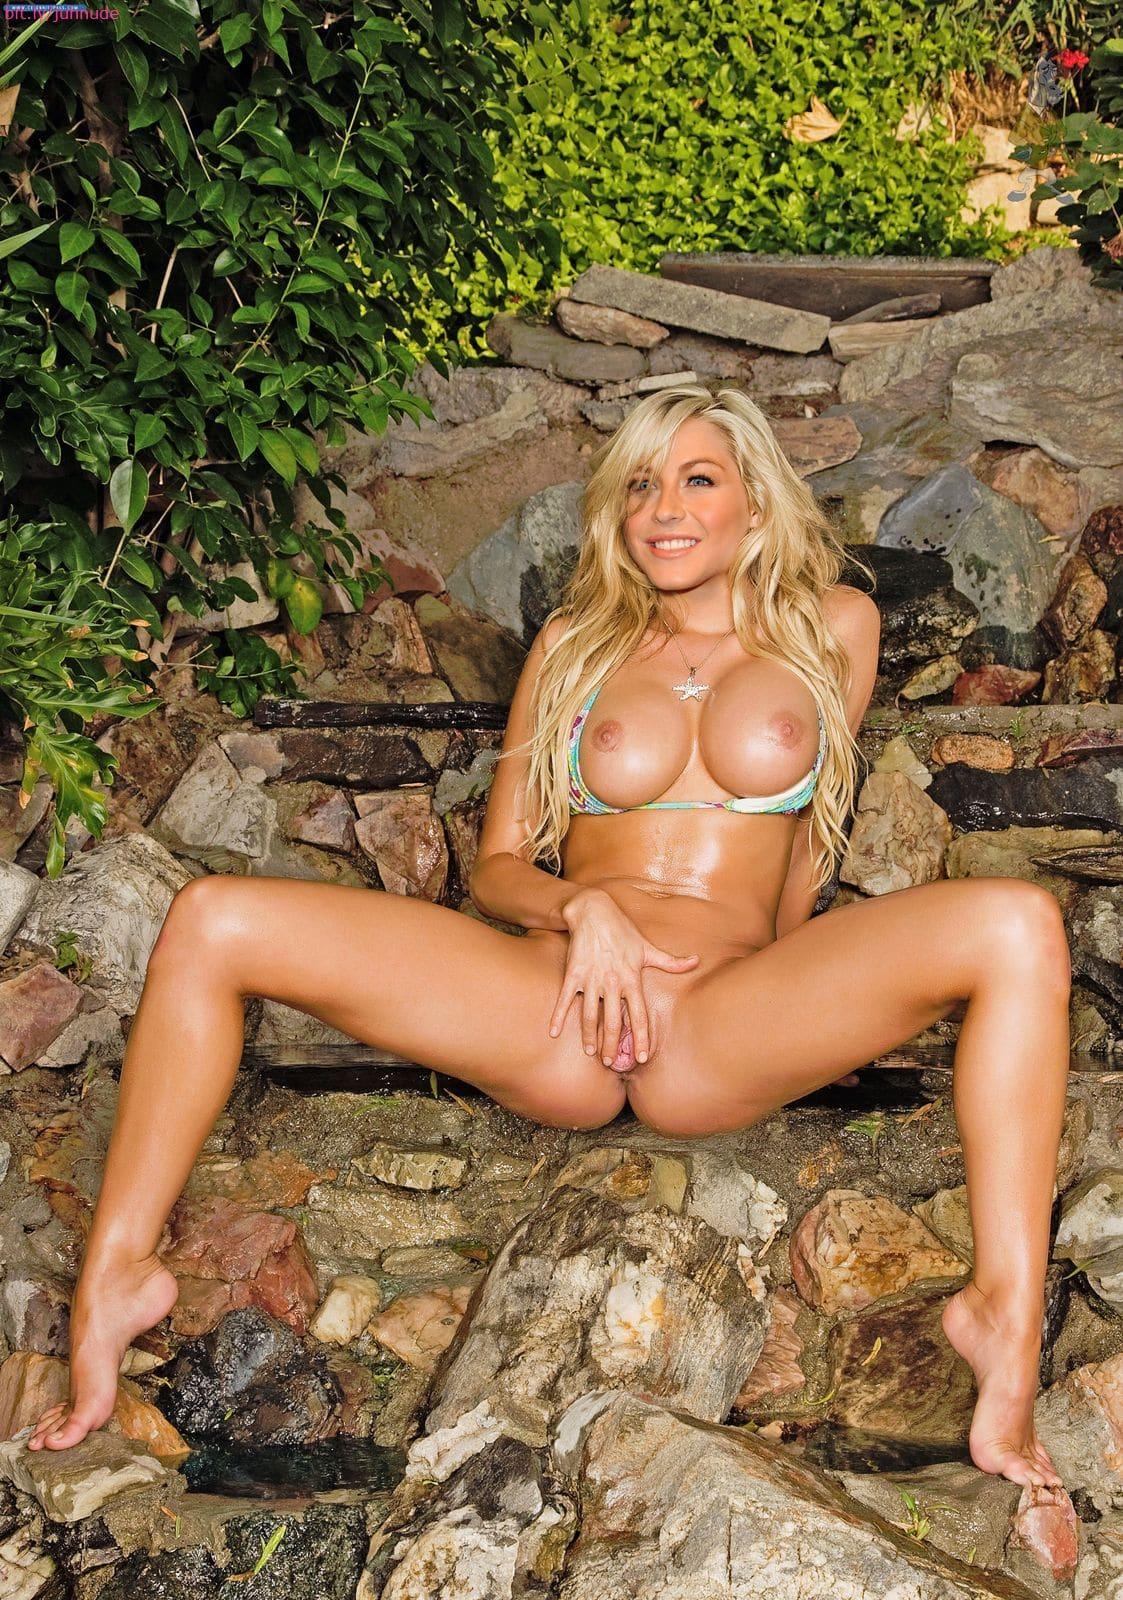 Juliana hough nude